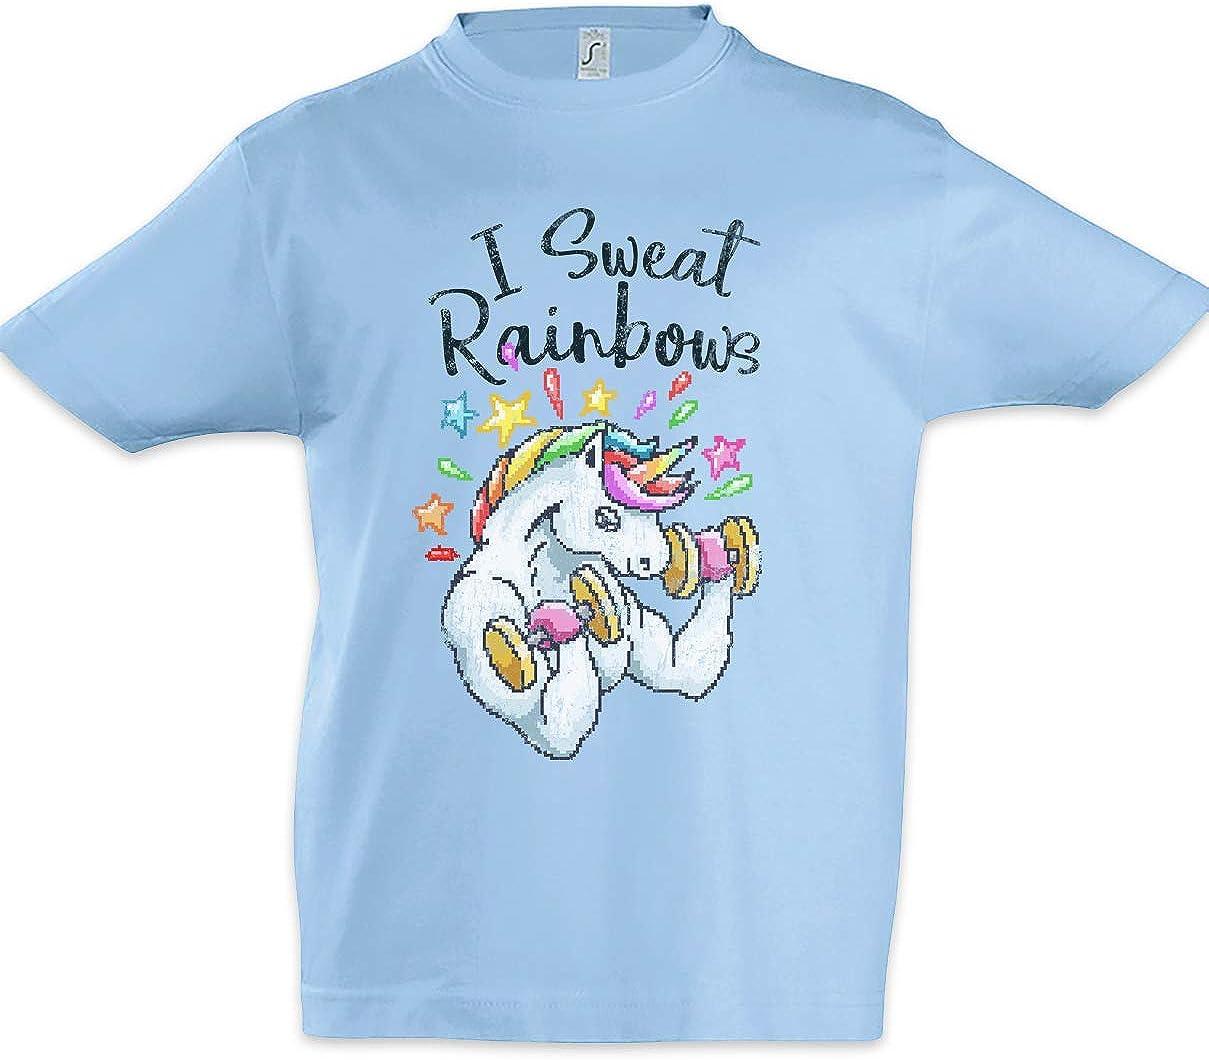 I Sweat Rainbows Kids Boys Children T-Shirt